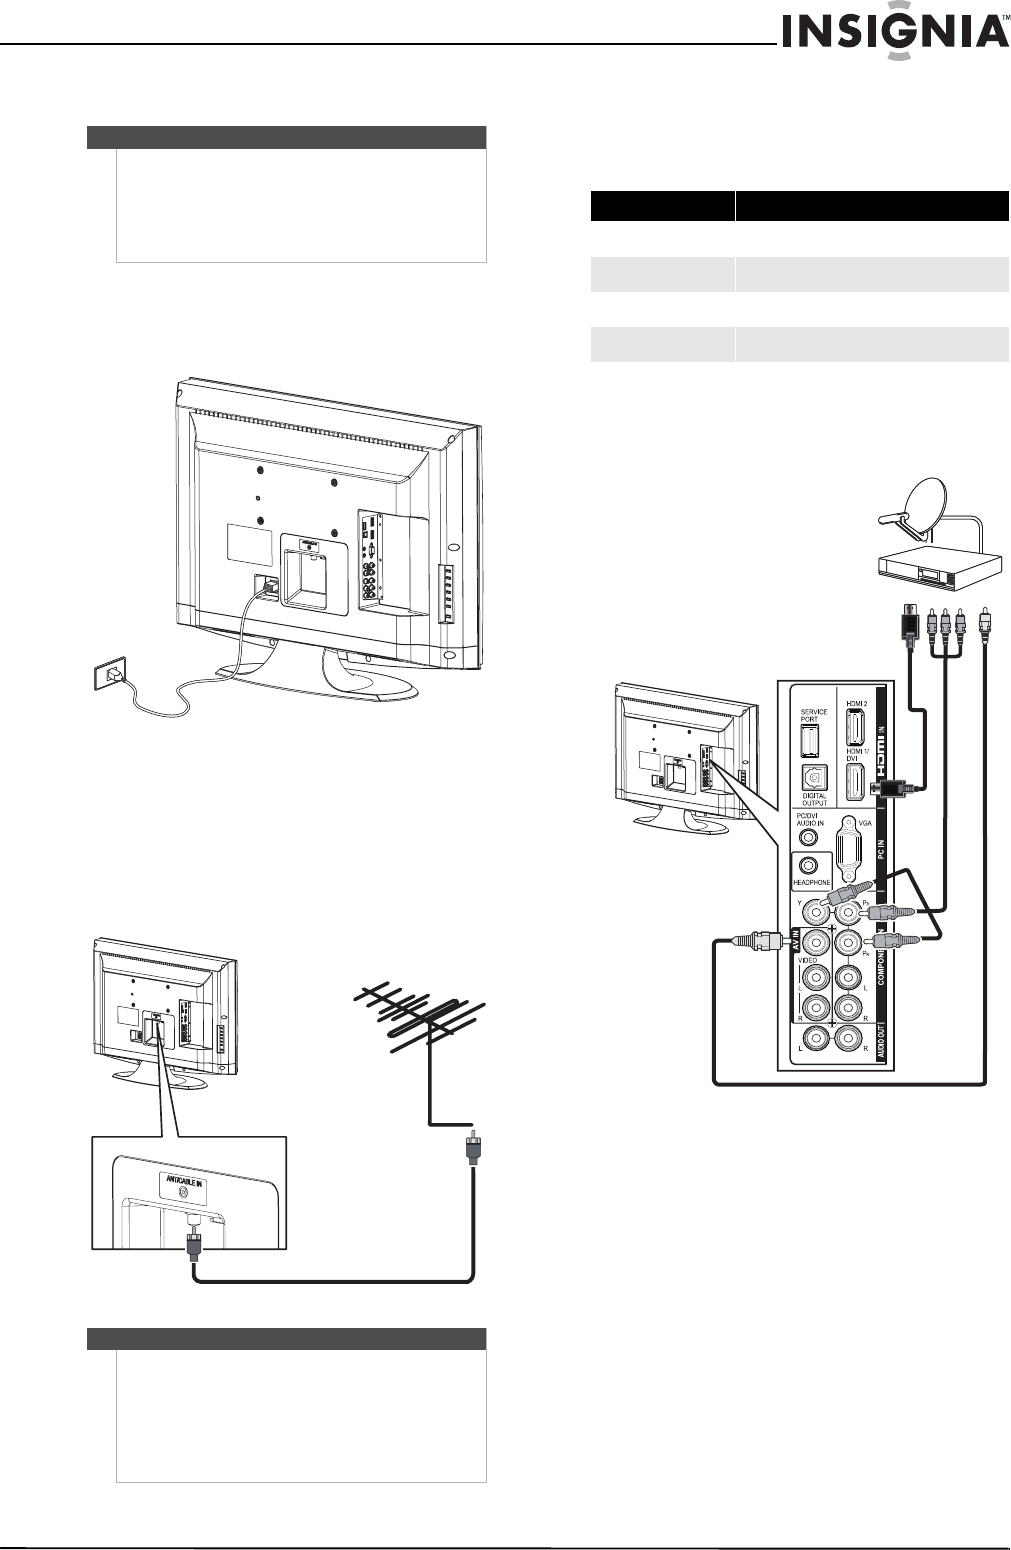 Insignia Ns 32l430a11 User Manual To The 06bf8e02 08d9 4fa2 B74b 1966 Mustang Philco Radio Wiring Diagram 13